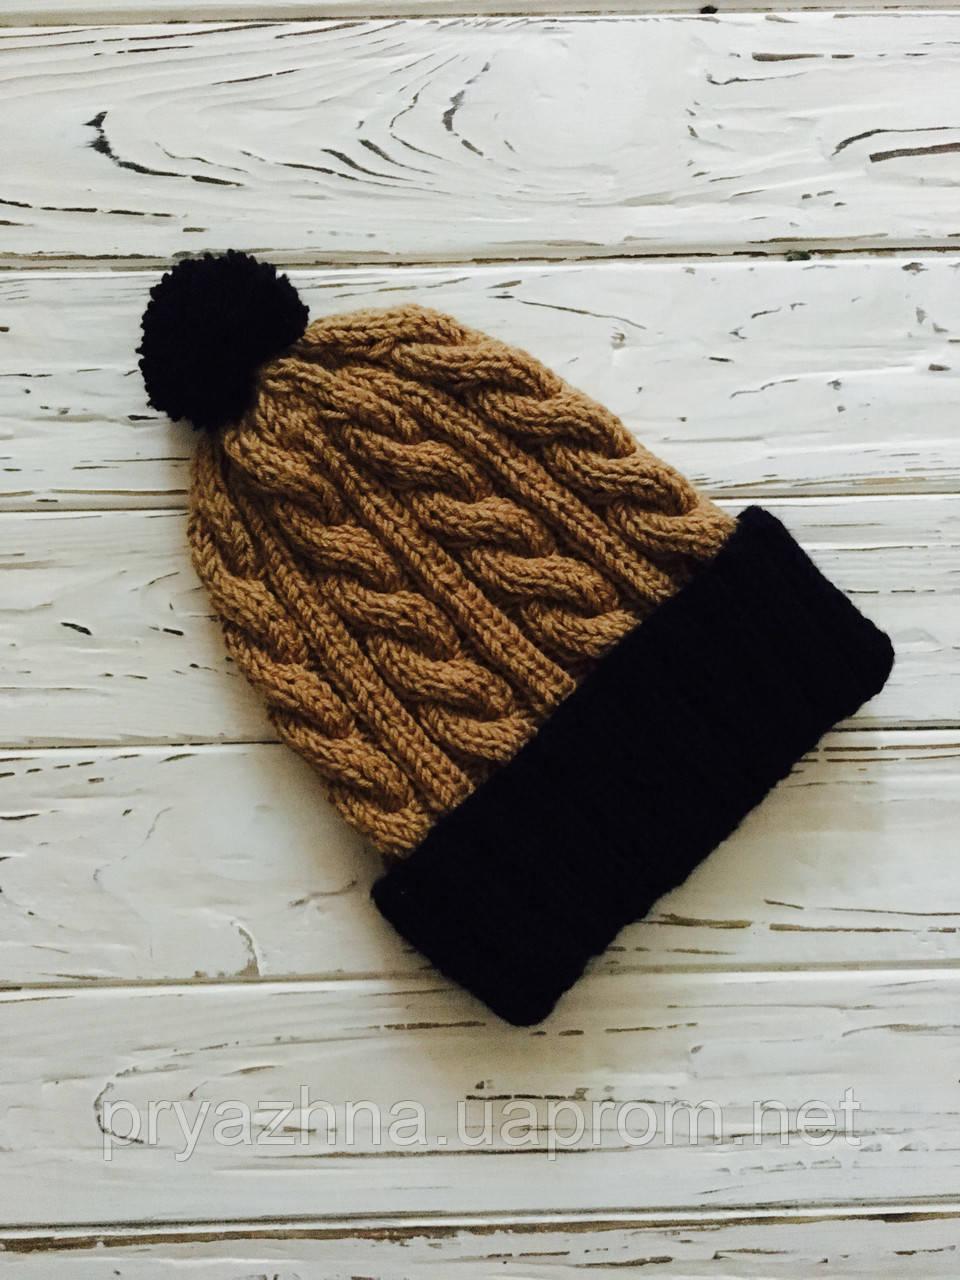 мужская вязаная шапка коричневый цвет вязаная шапка с помпоном